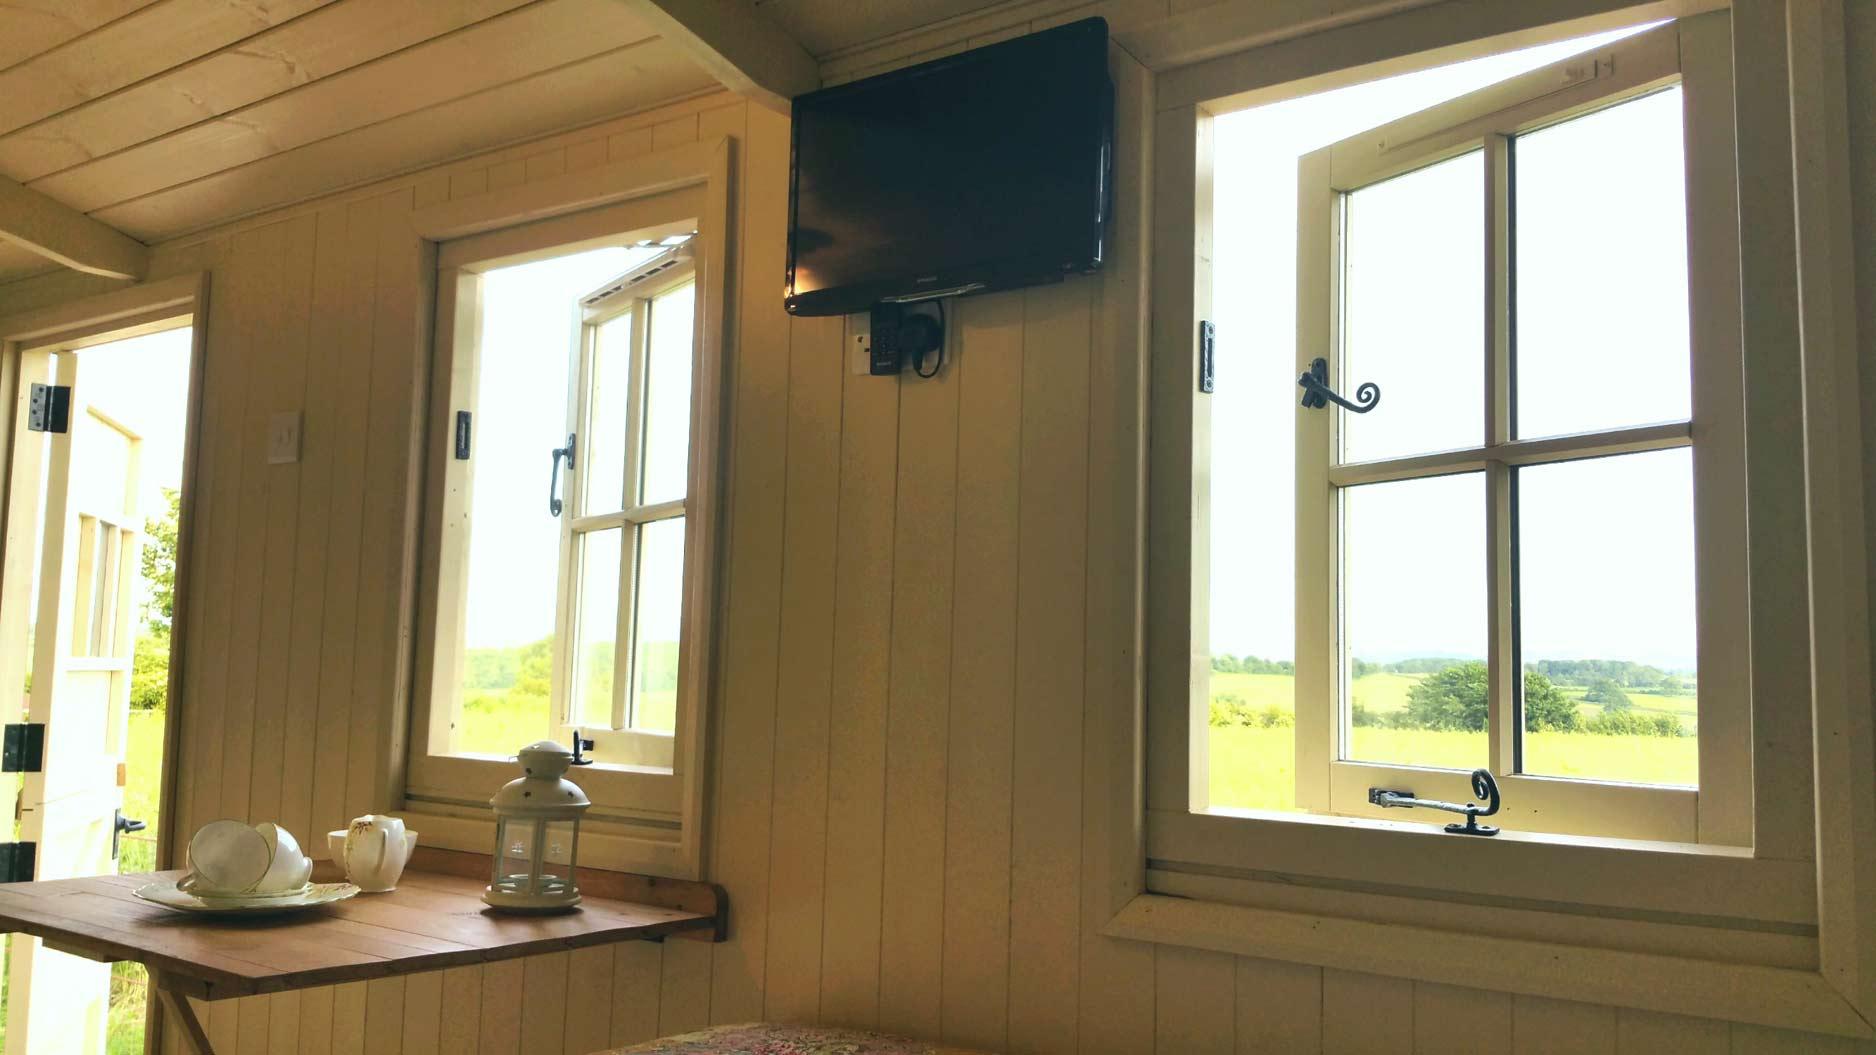 TV-and-View-Inside-Shepherds-Hut-Panoram-Bath